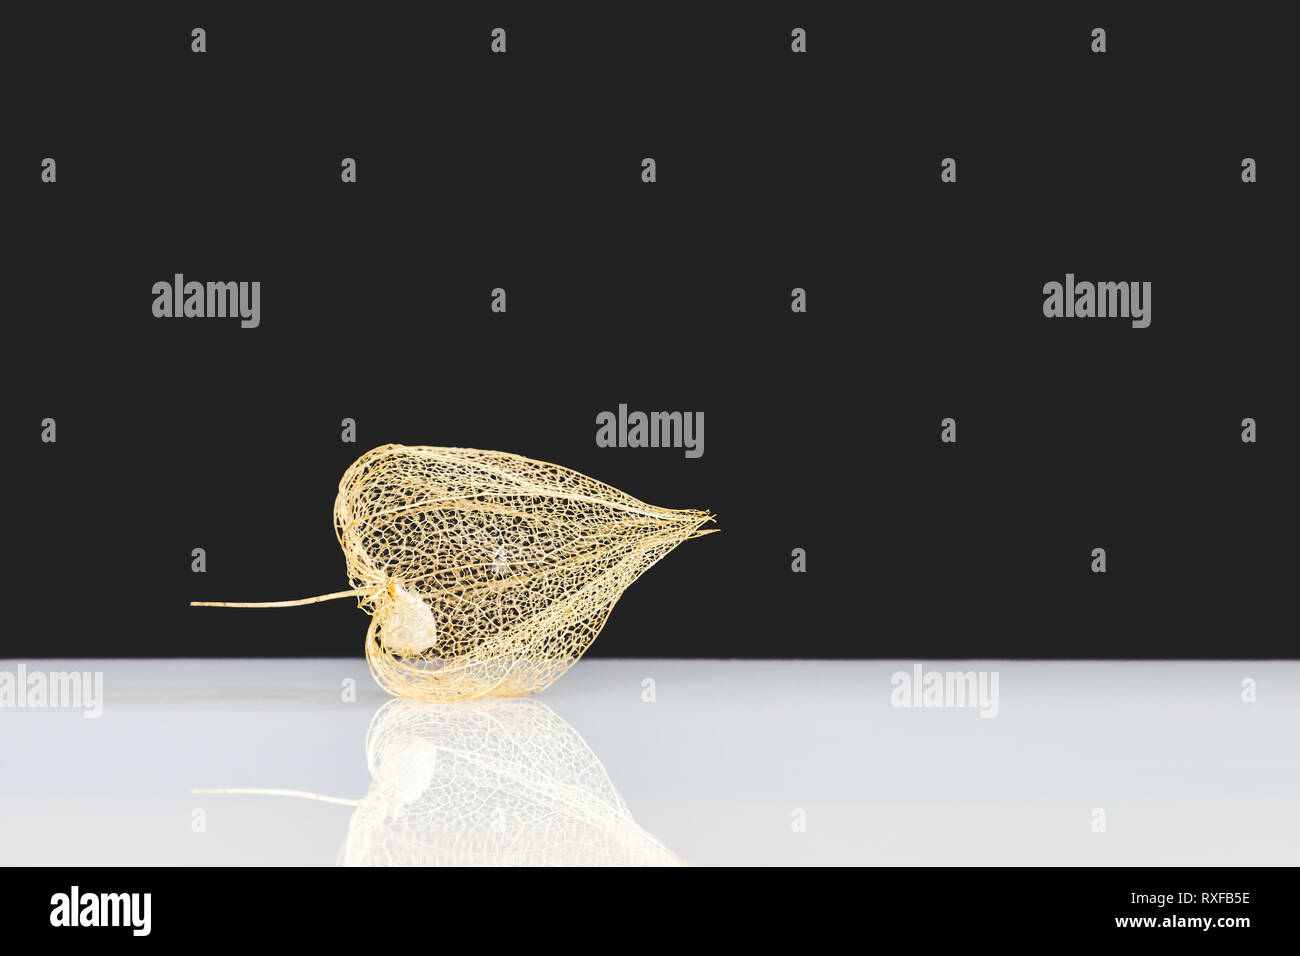 Lampionblume mit Spiegelung, Studioaufnahme - Stock Image